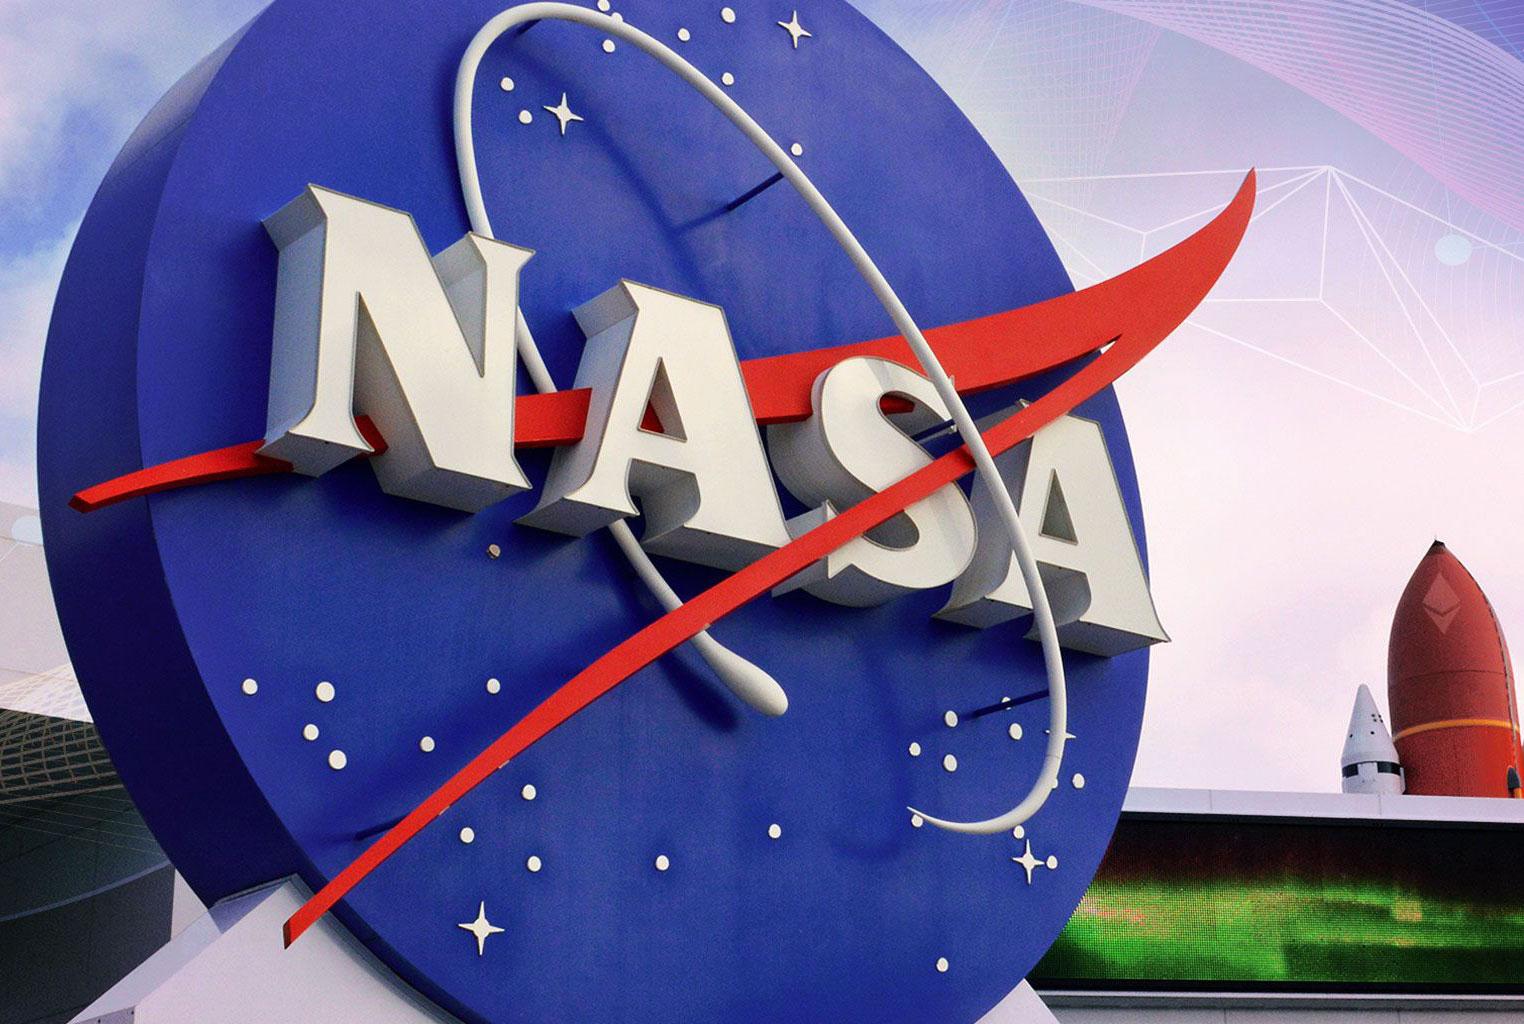 NASA launches longest mission to explore distant asteroids